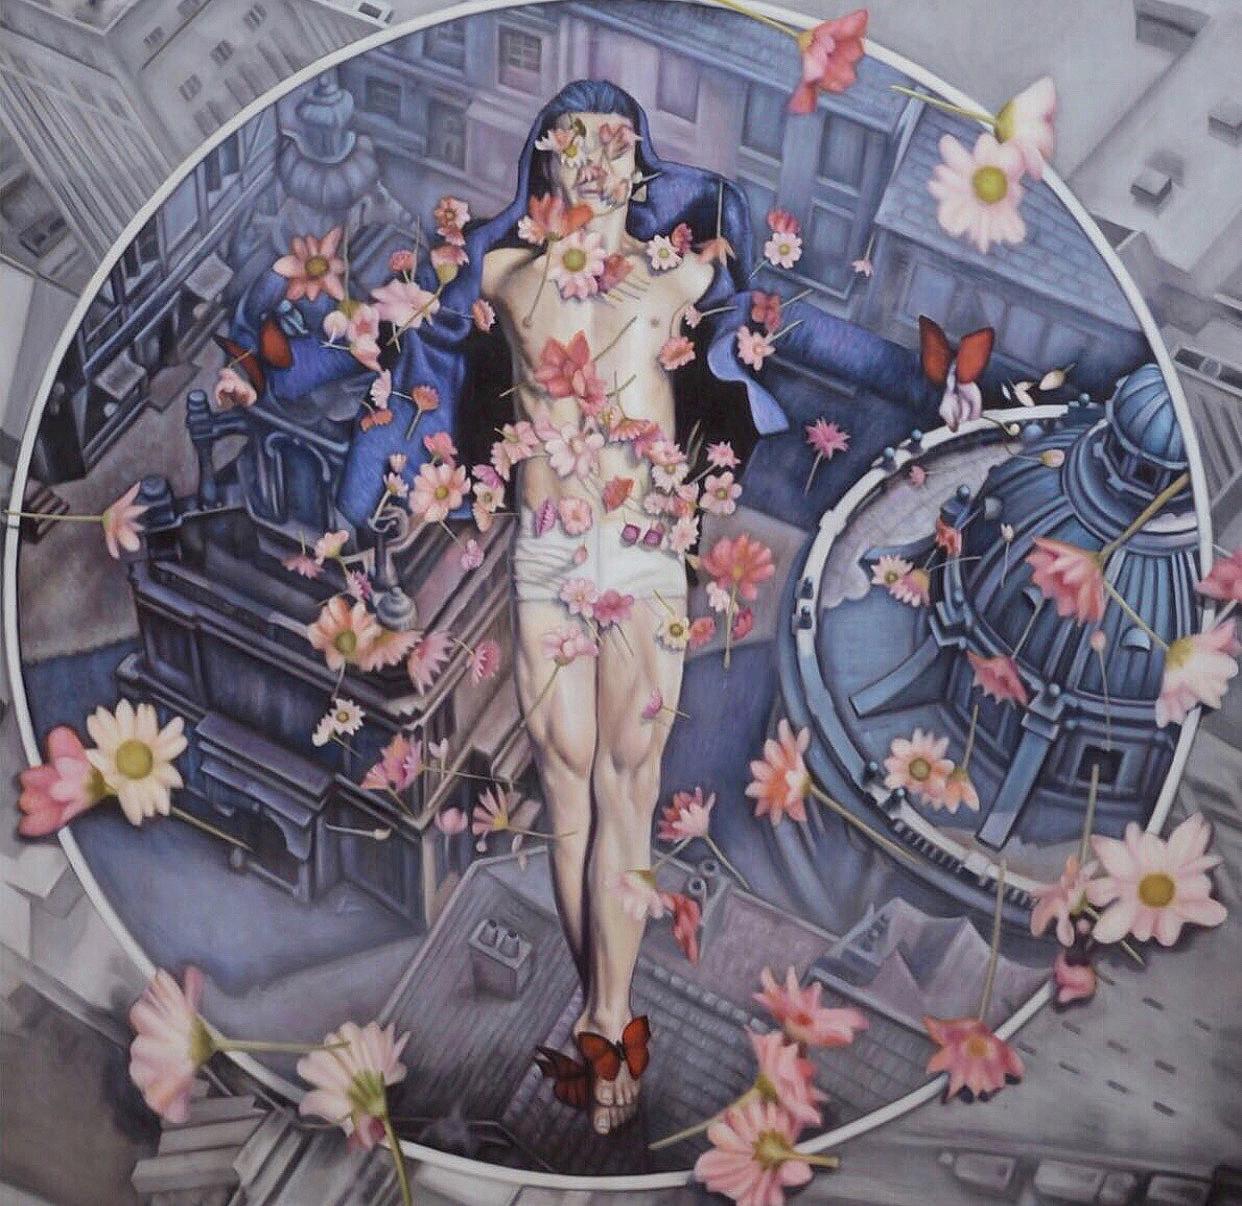 Aiman Hakim Artist Singapore Utarit koons Oil Painting asian jesus